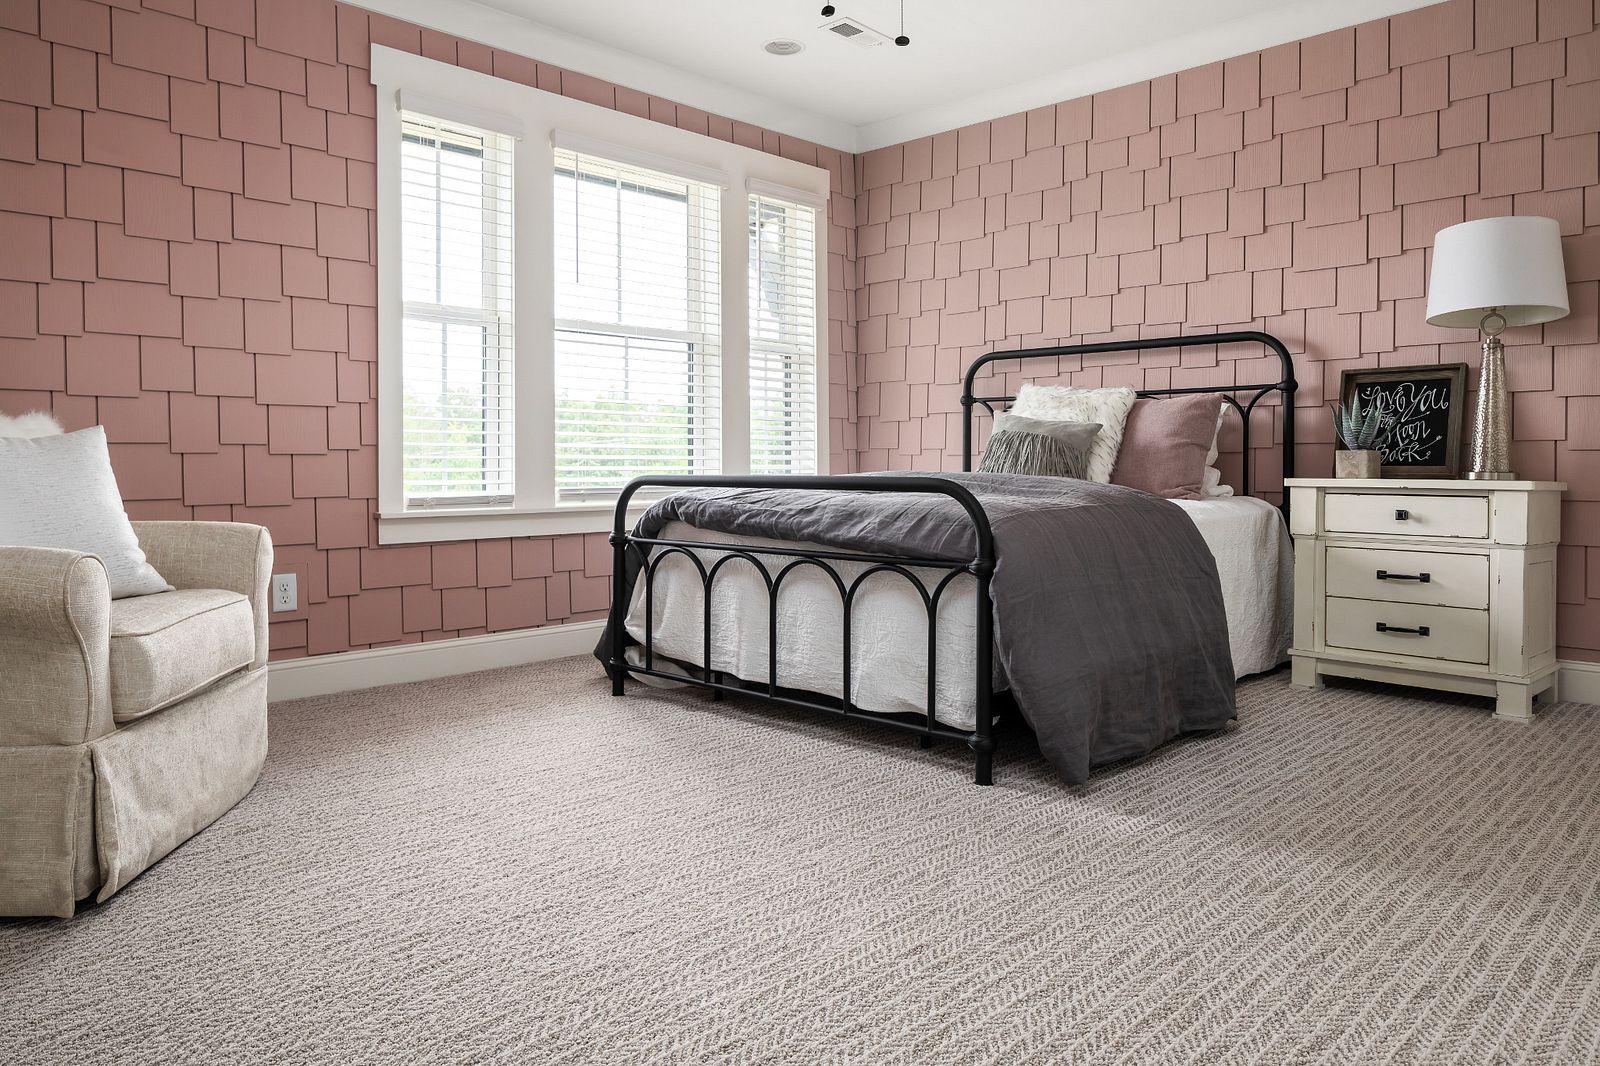 Shaw Carpet Warranty Five Fiber Warranties Floors